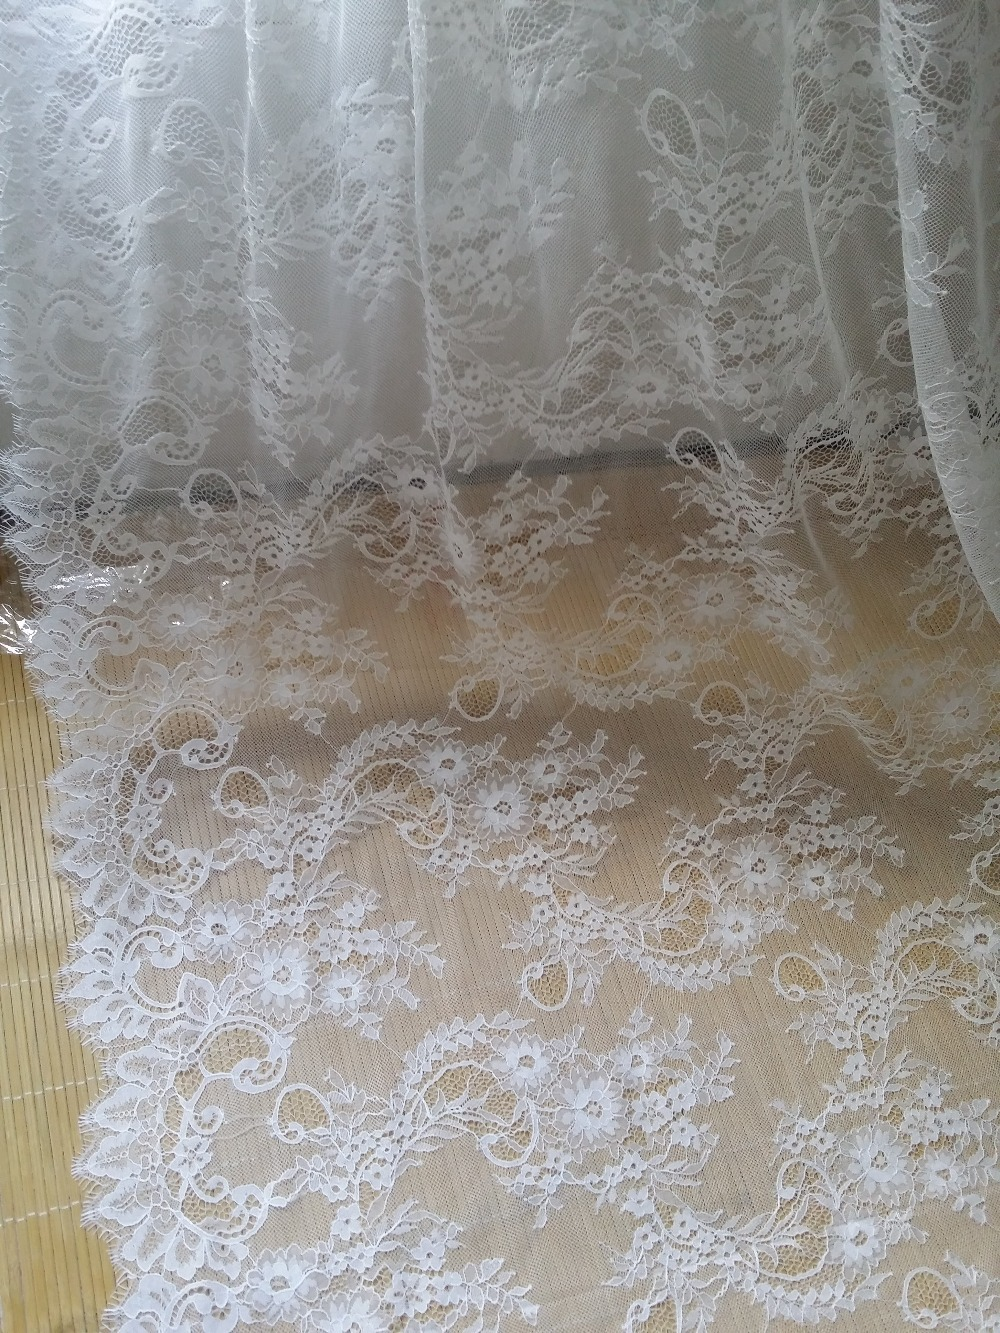 3m long eyelash chantilly lace traditional wedding lace - Chantilly telas ...